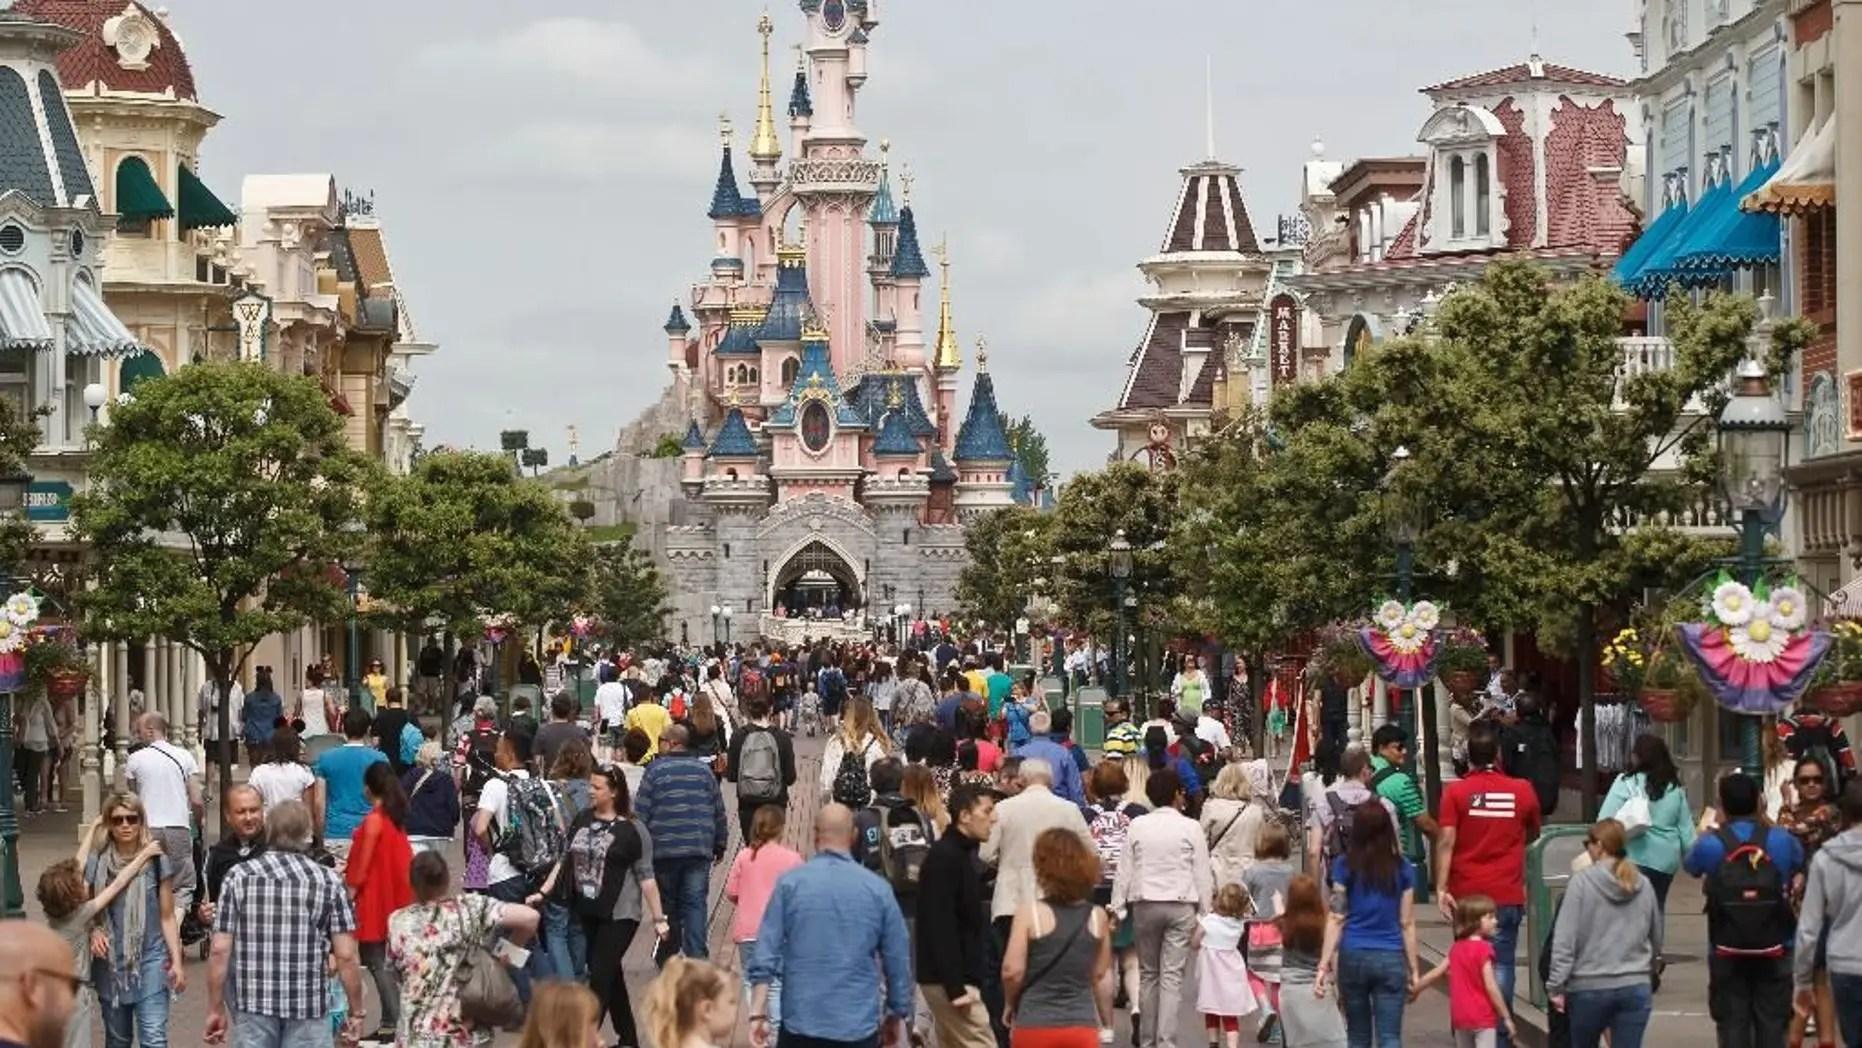 Disneyland Paris Host Official Lgbtq Pride Celebration Disney Parks Fox